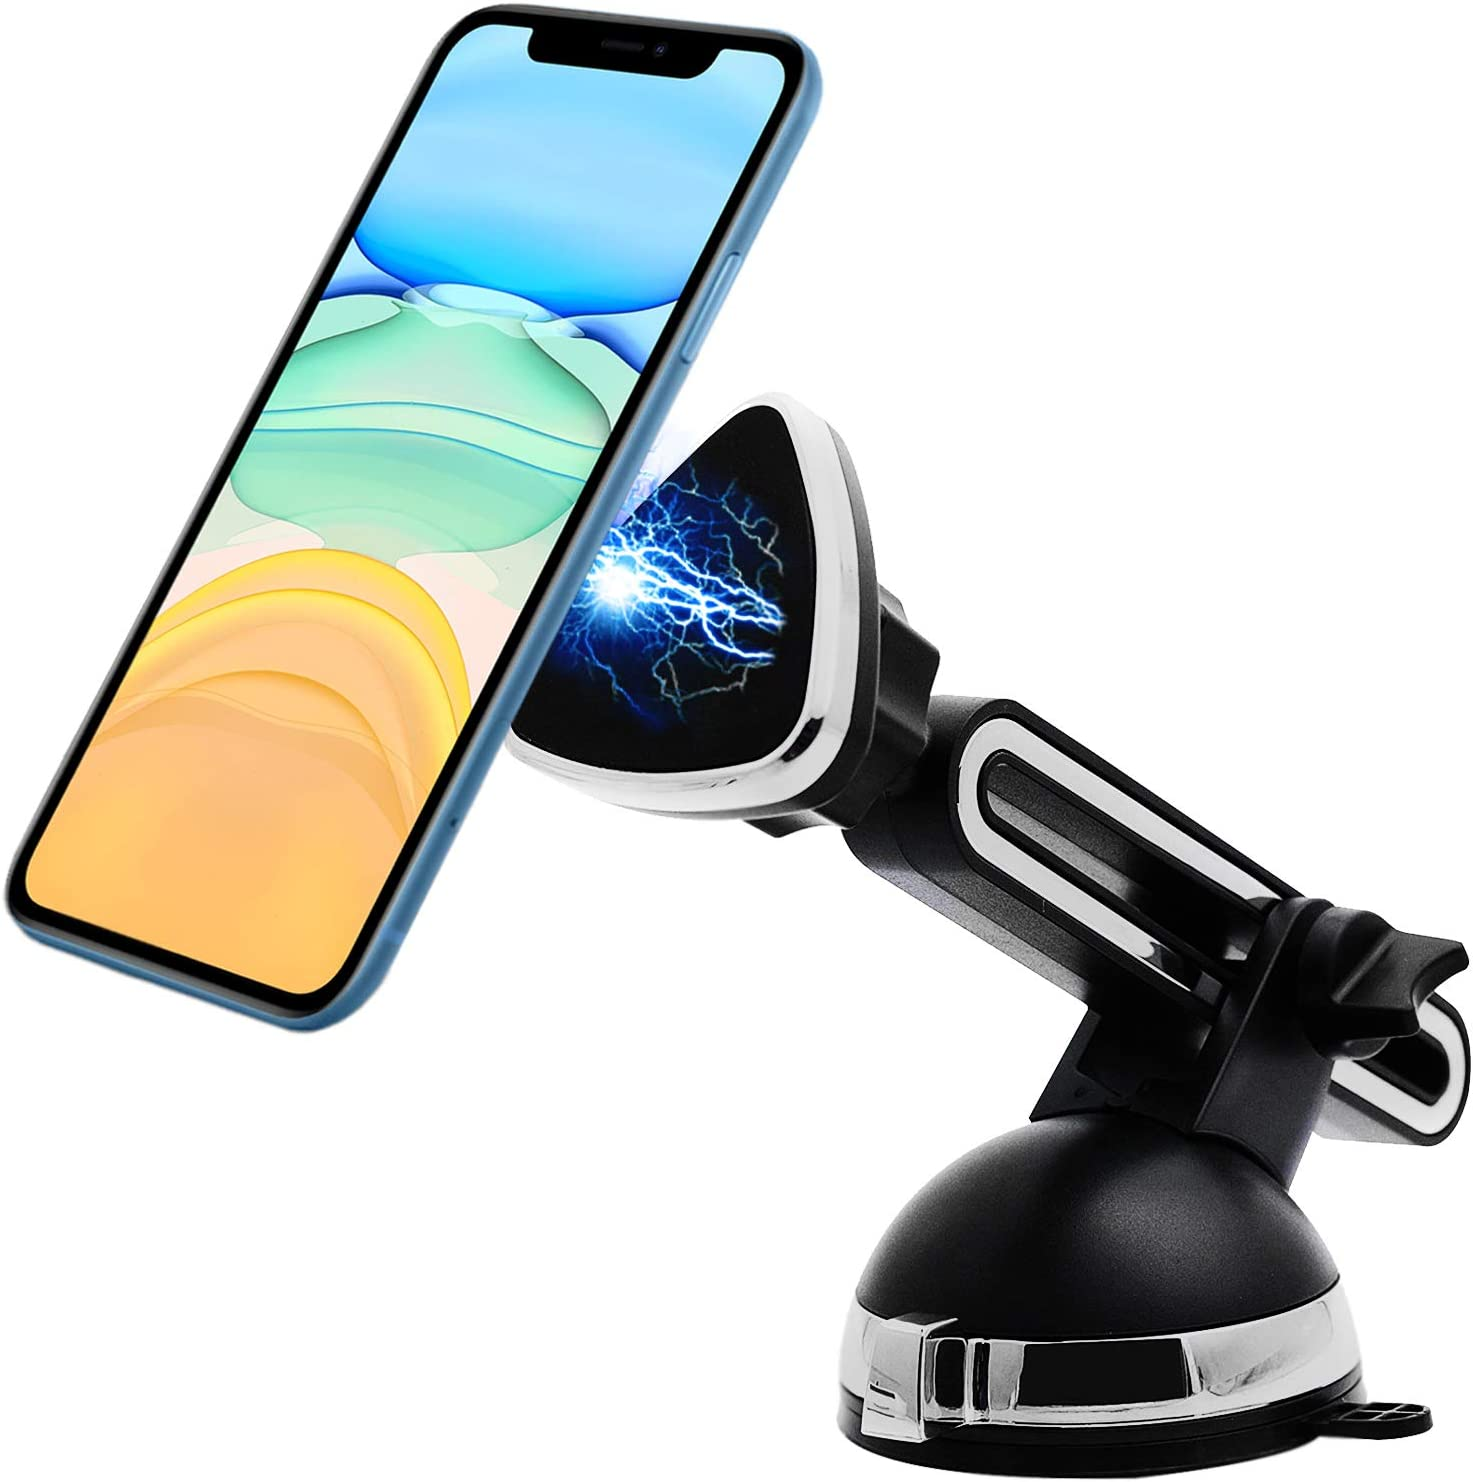 Soporte movil Coche Ventosa magnetico valido para telefonos ...